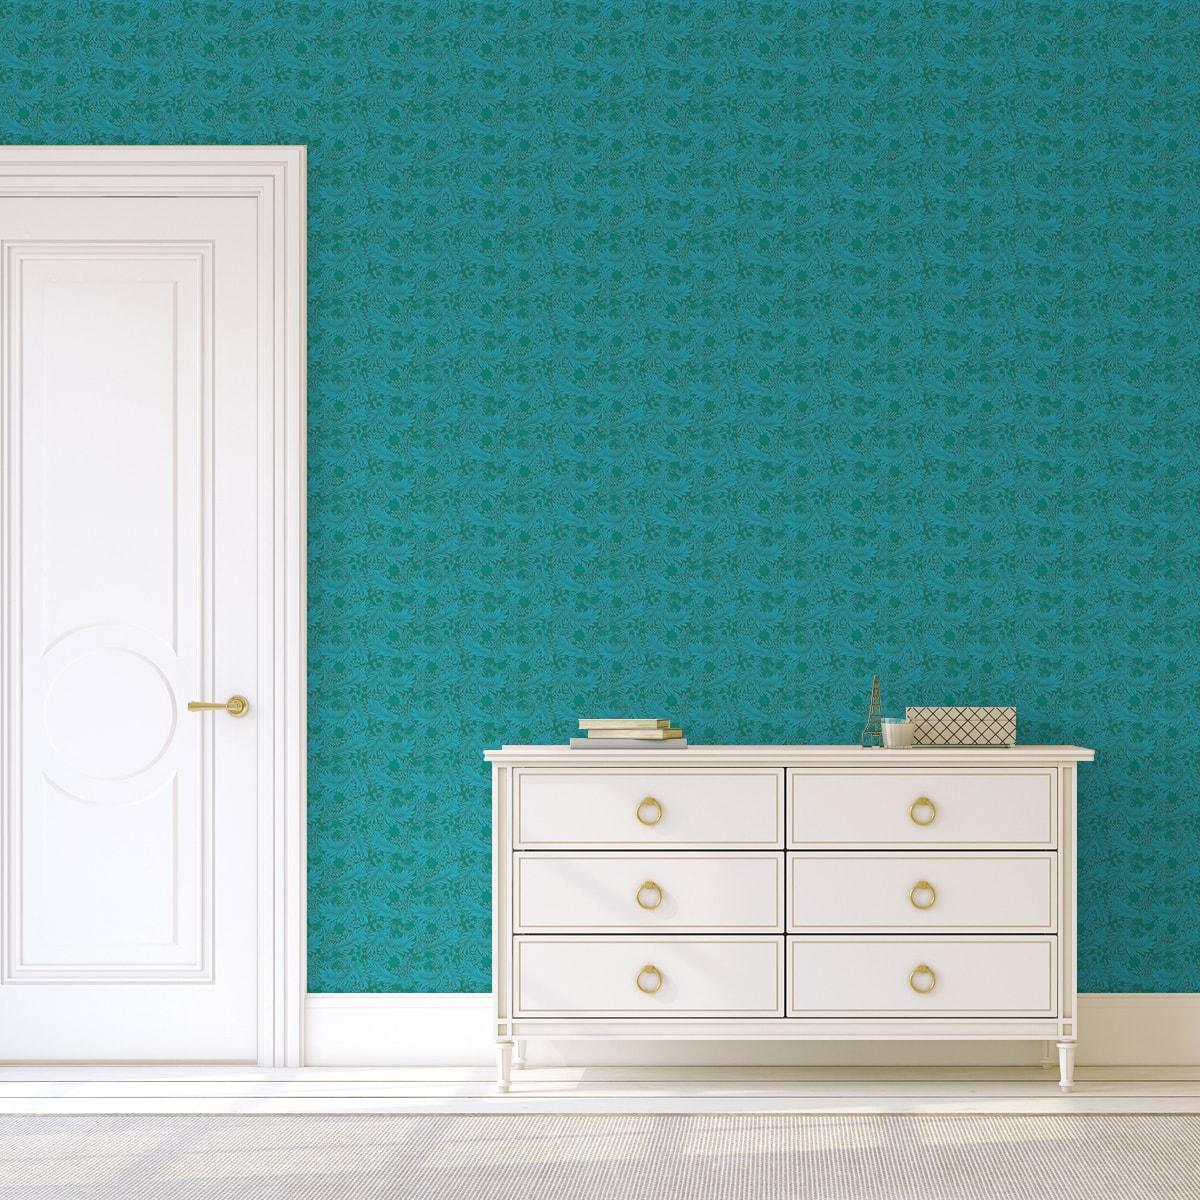 "Türkis grüne, Jugendstil Tapete ""Délice florale"" nach William Morris kleiner Rapport Vlies Ornamenttapete für Flur, Büro"